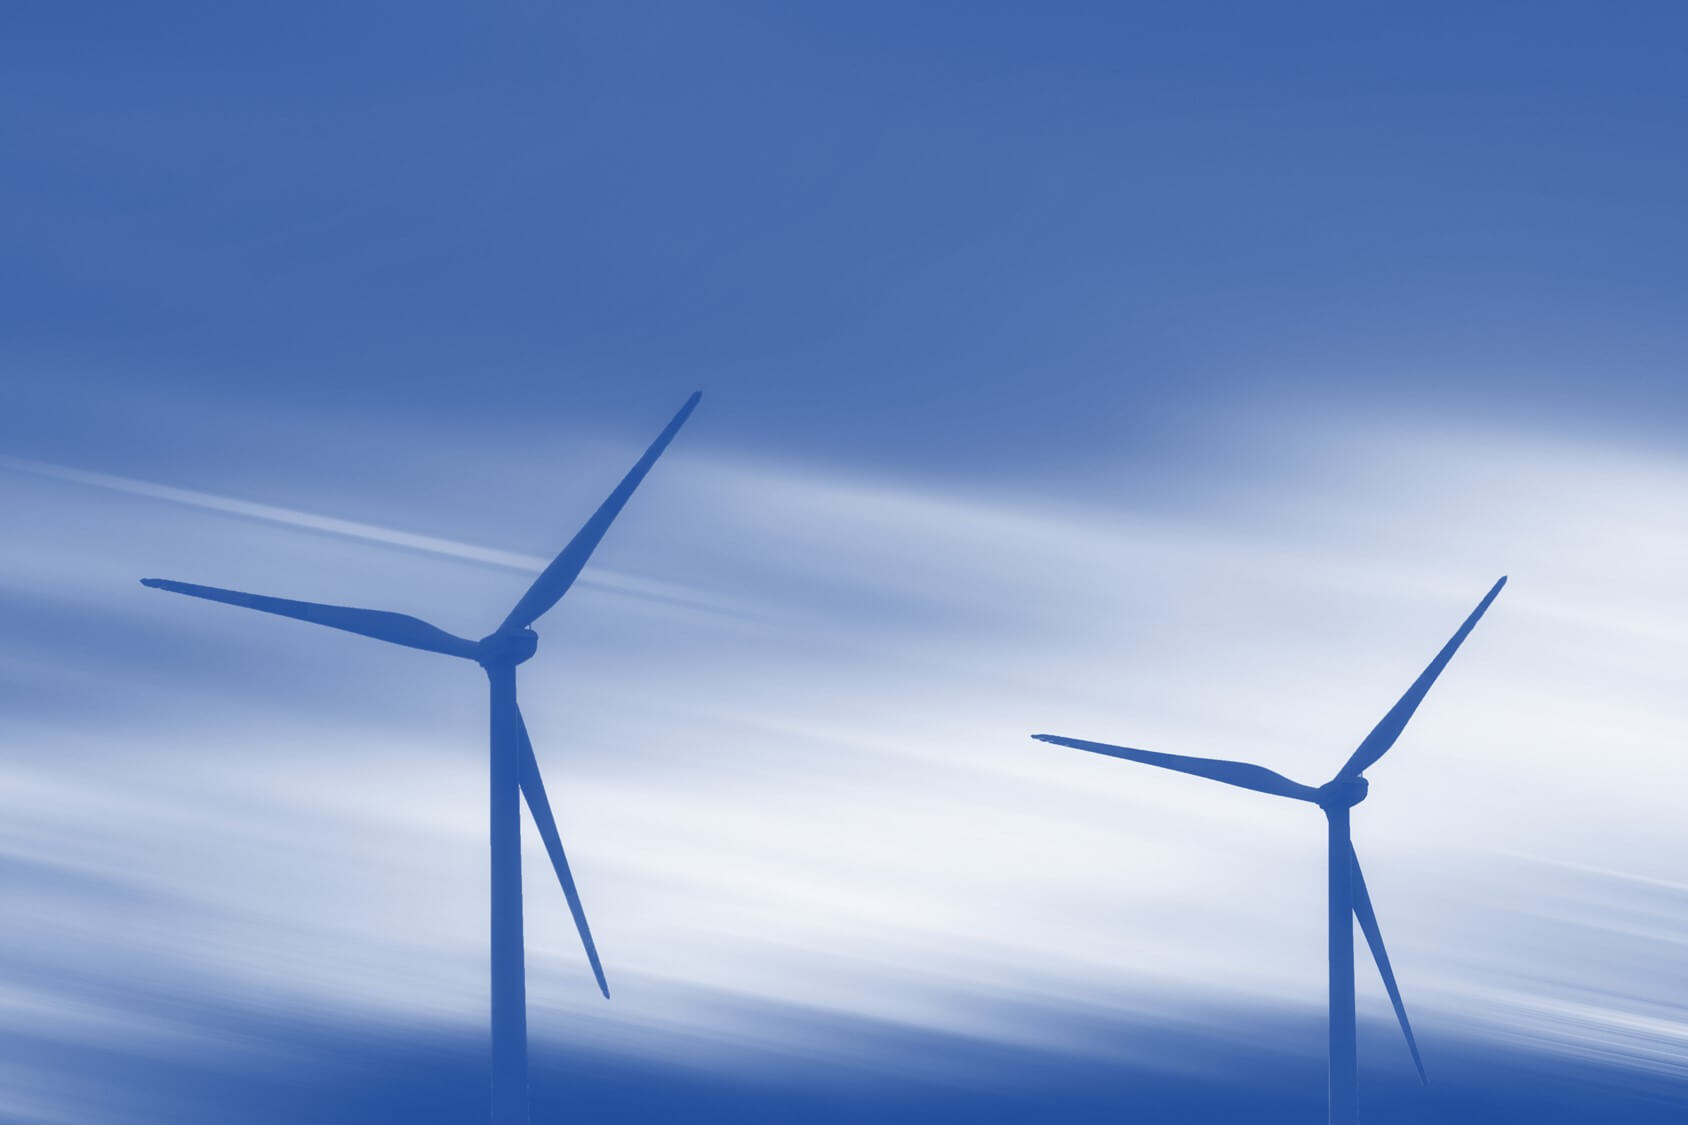 Energiebranche im Wandel